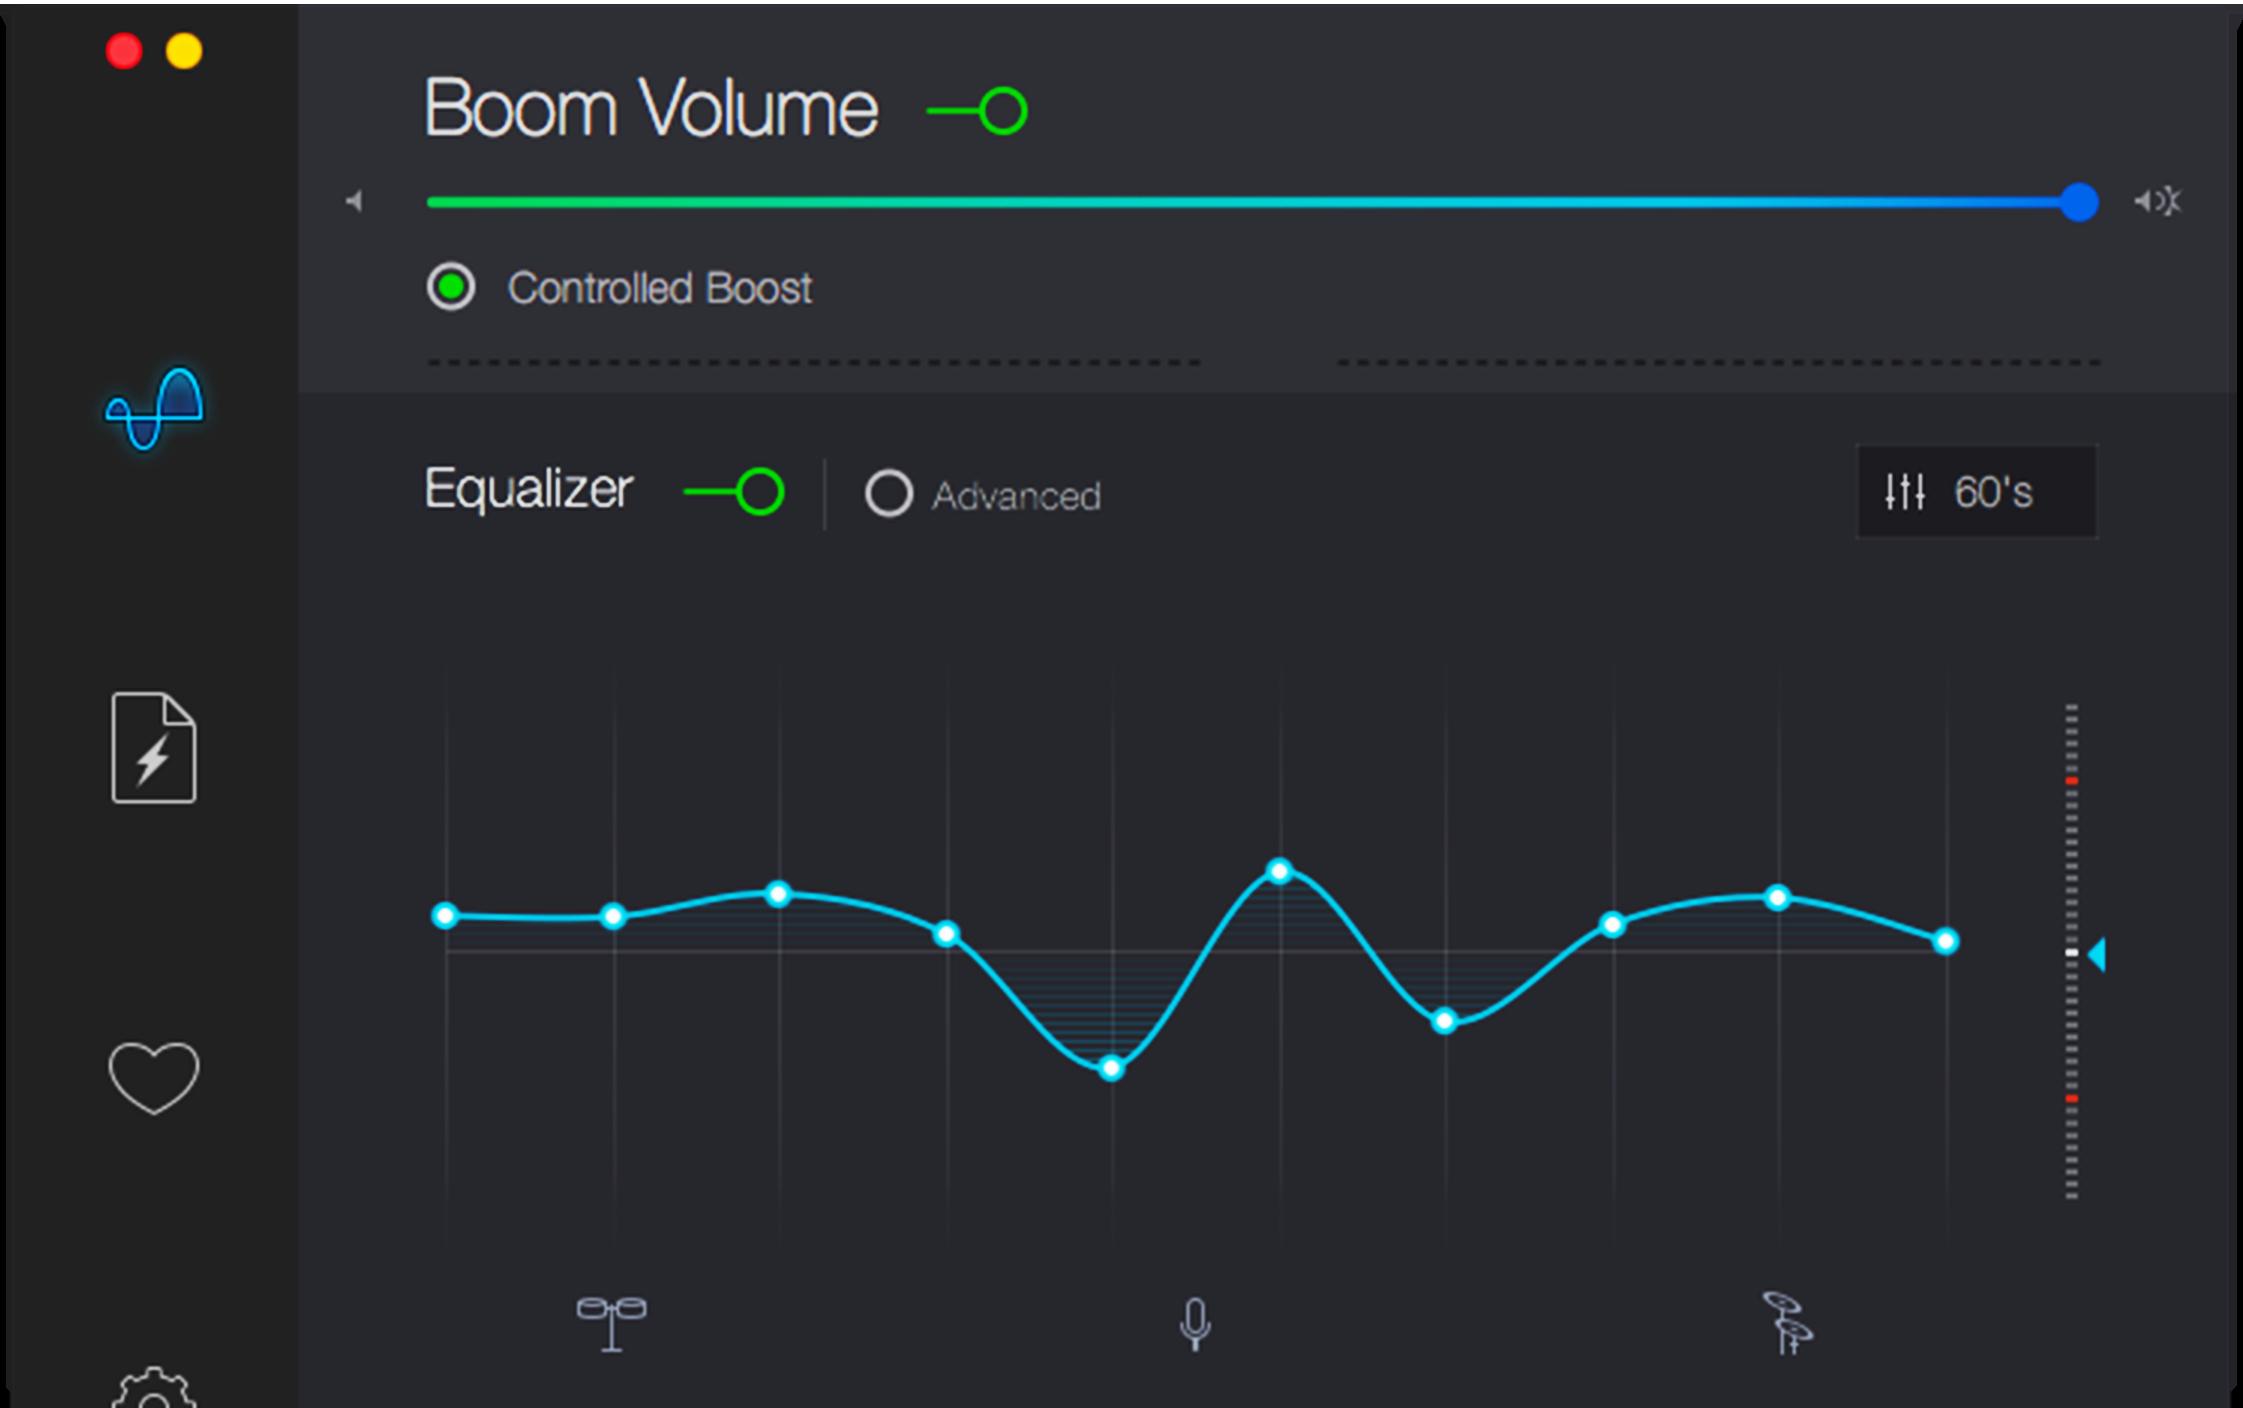 Boom 2 Mac volume booster interface